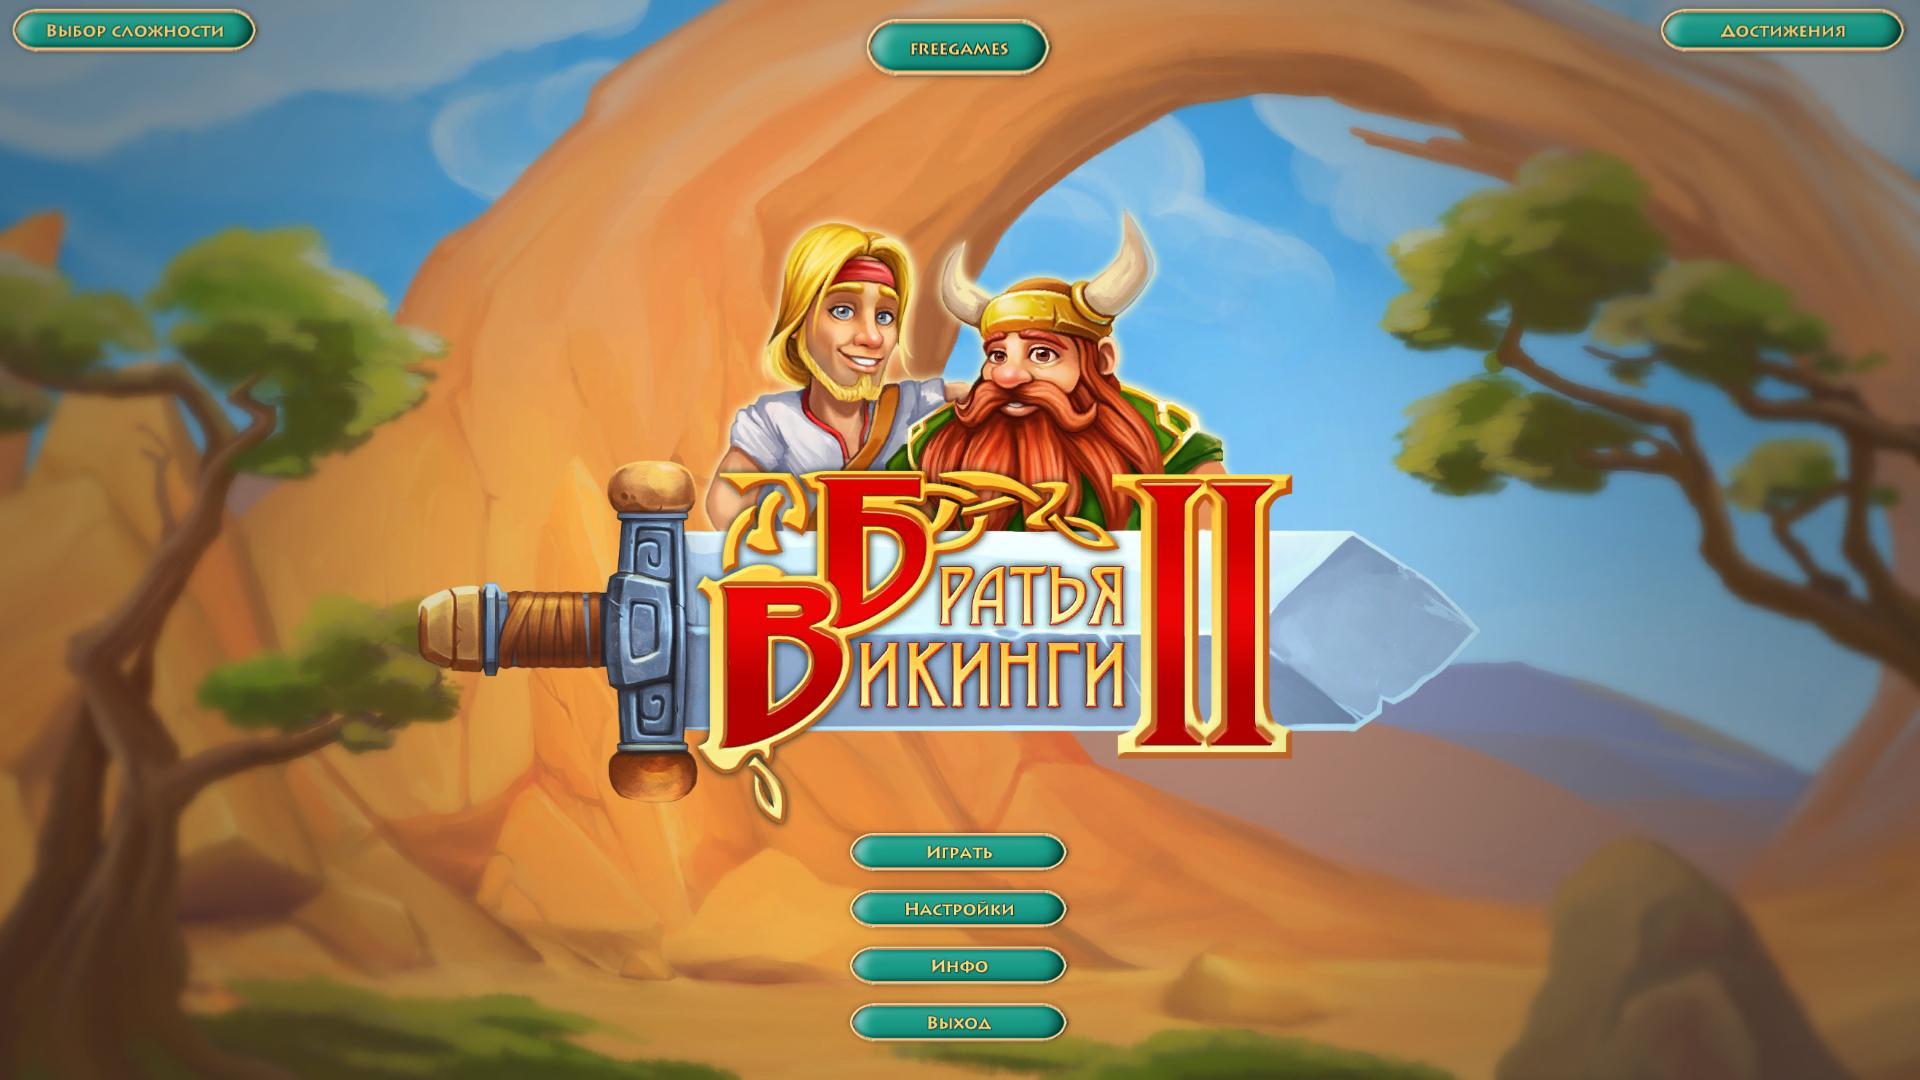 Братья Викинги 2 | Viking Brothers 2 (Rus)